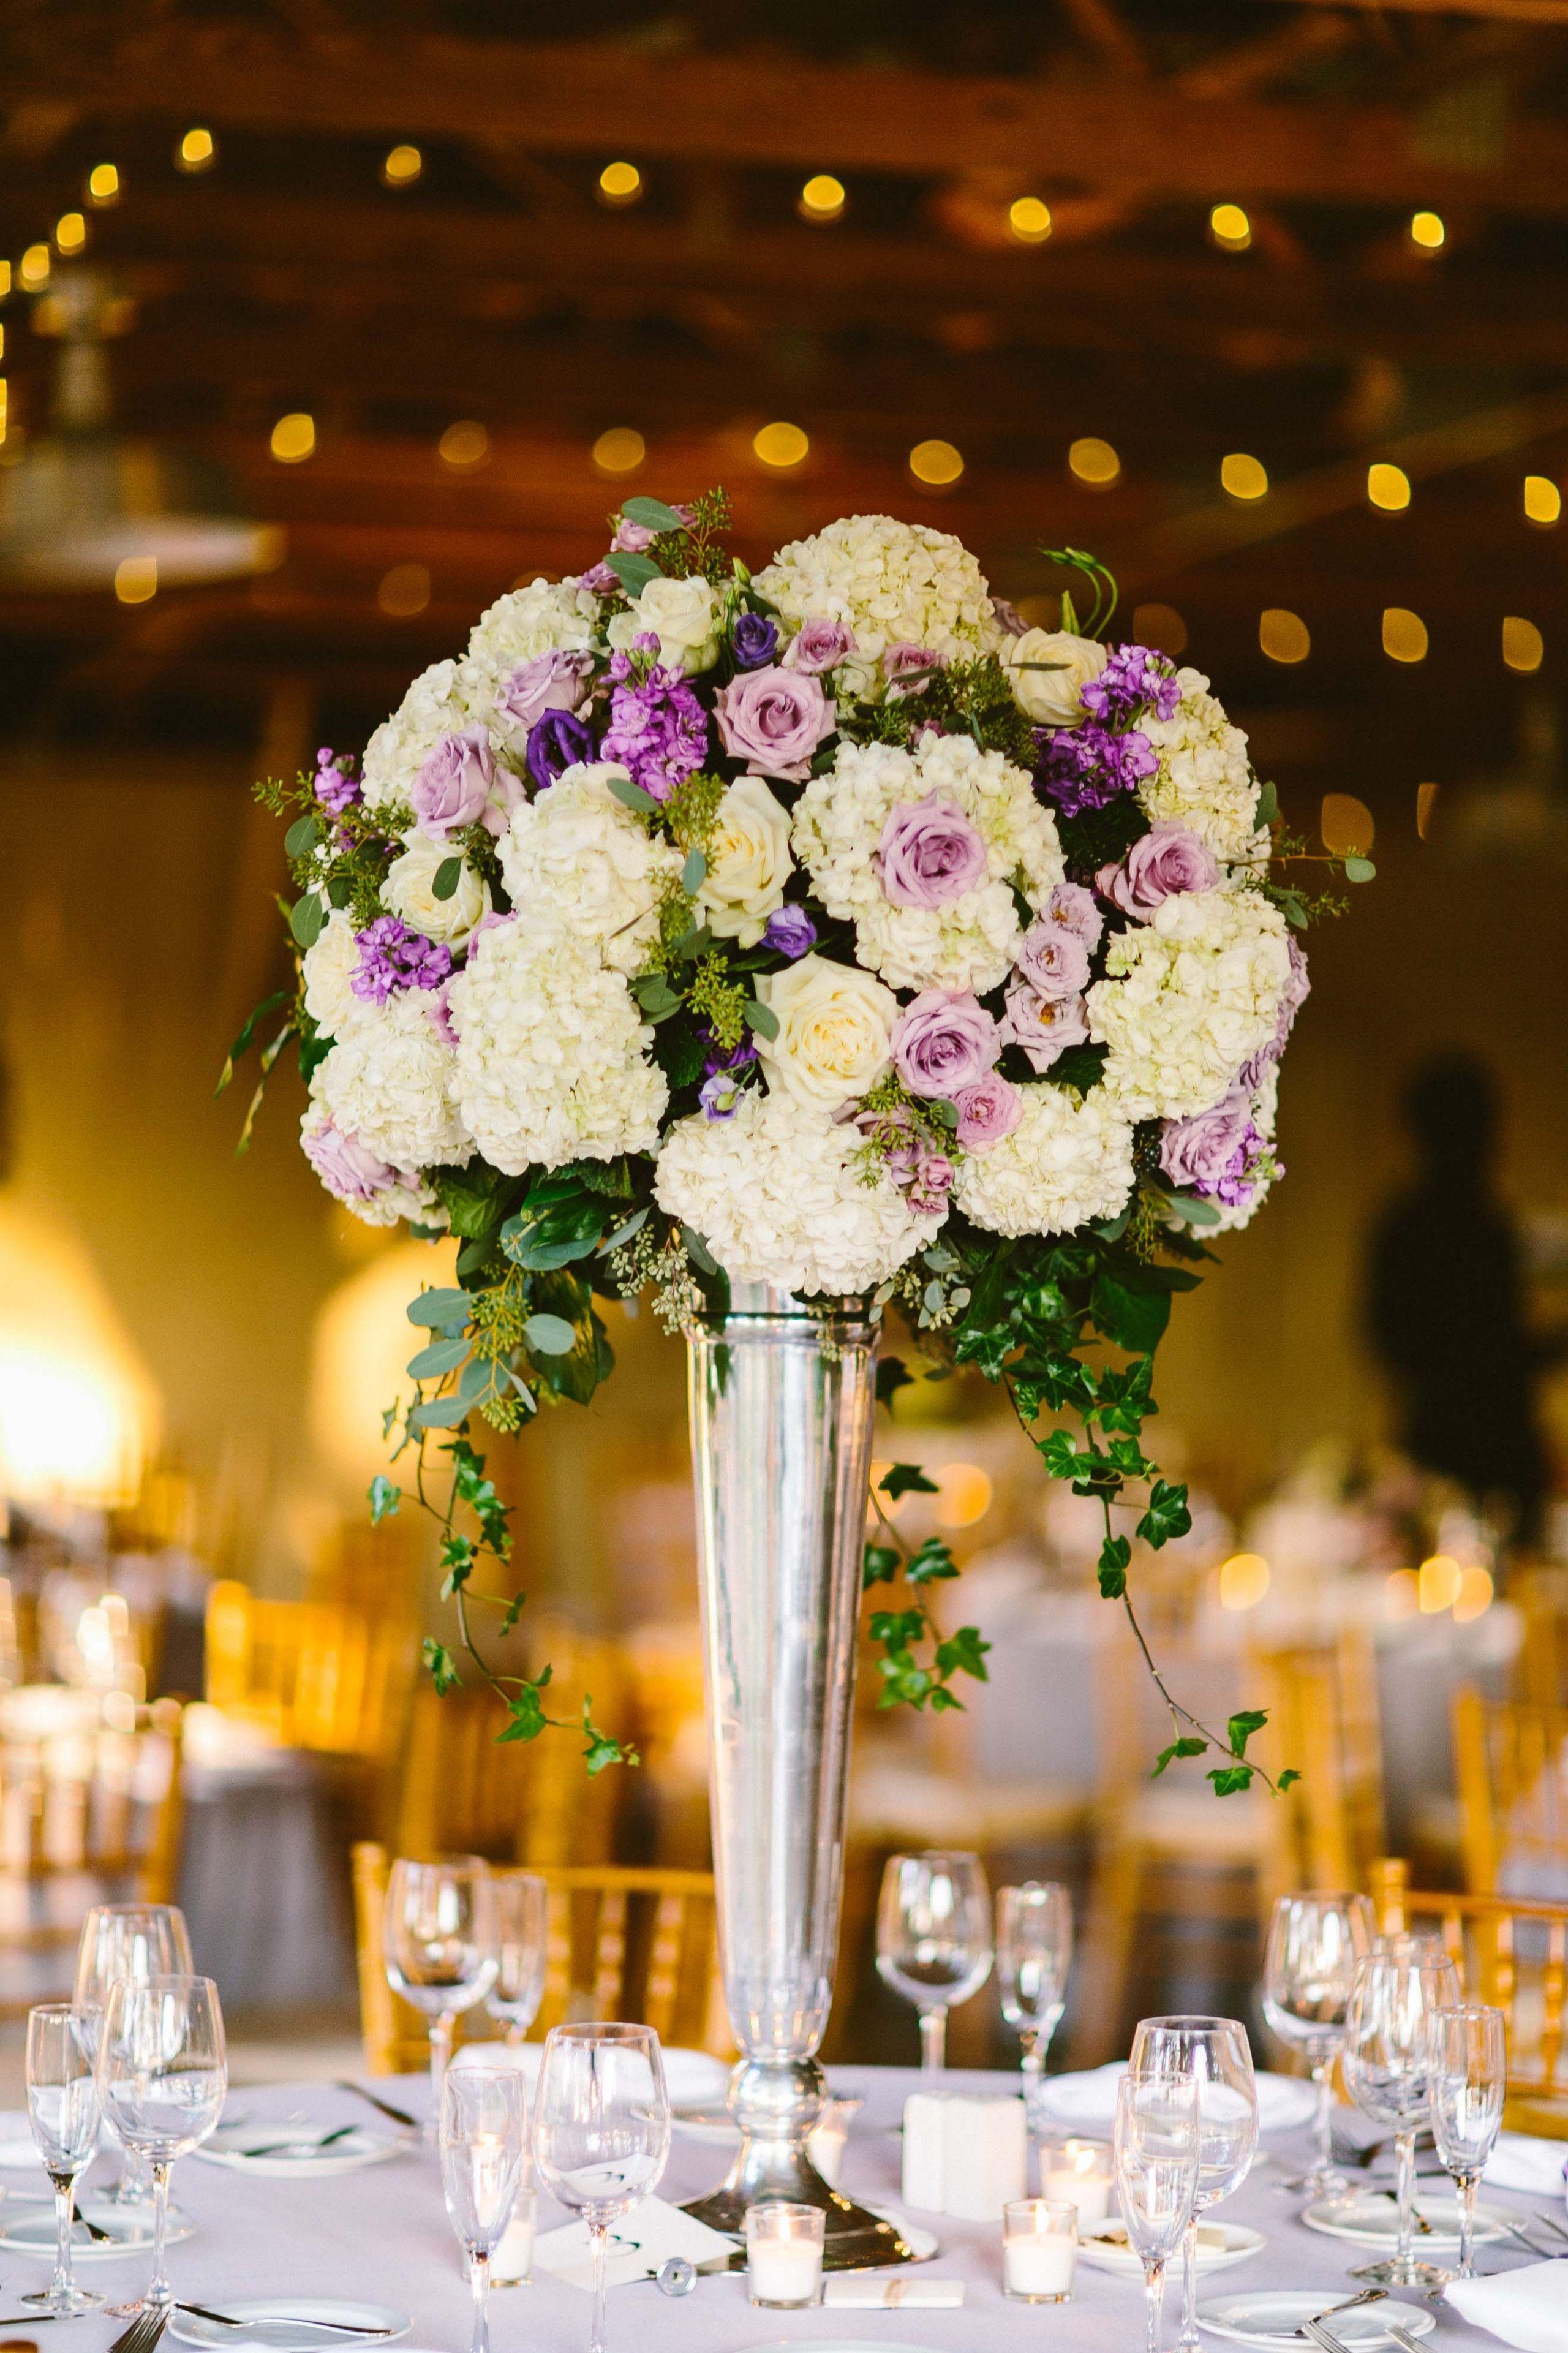 Wedding decoration ideas purple  Purple Rose Gold Wedding Centerpiece Ideas  ivory wedding